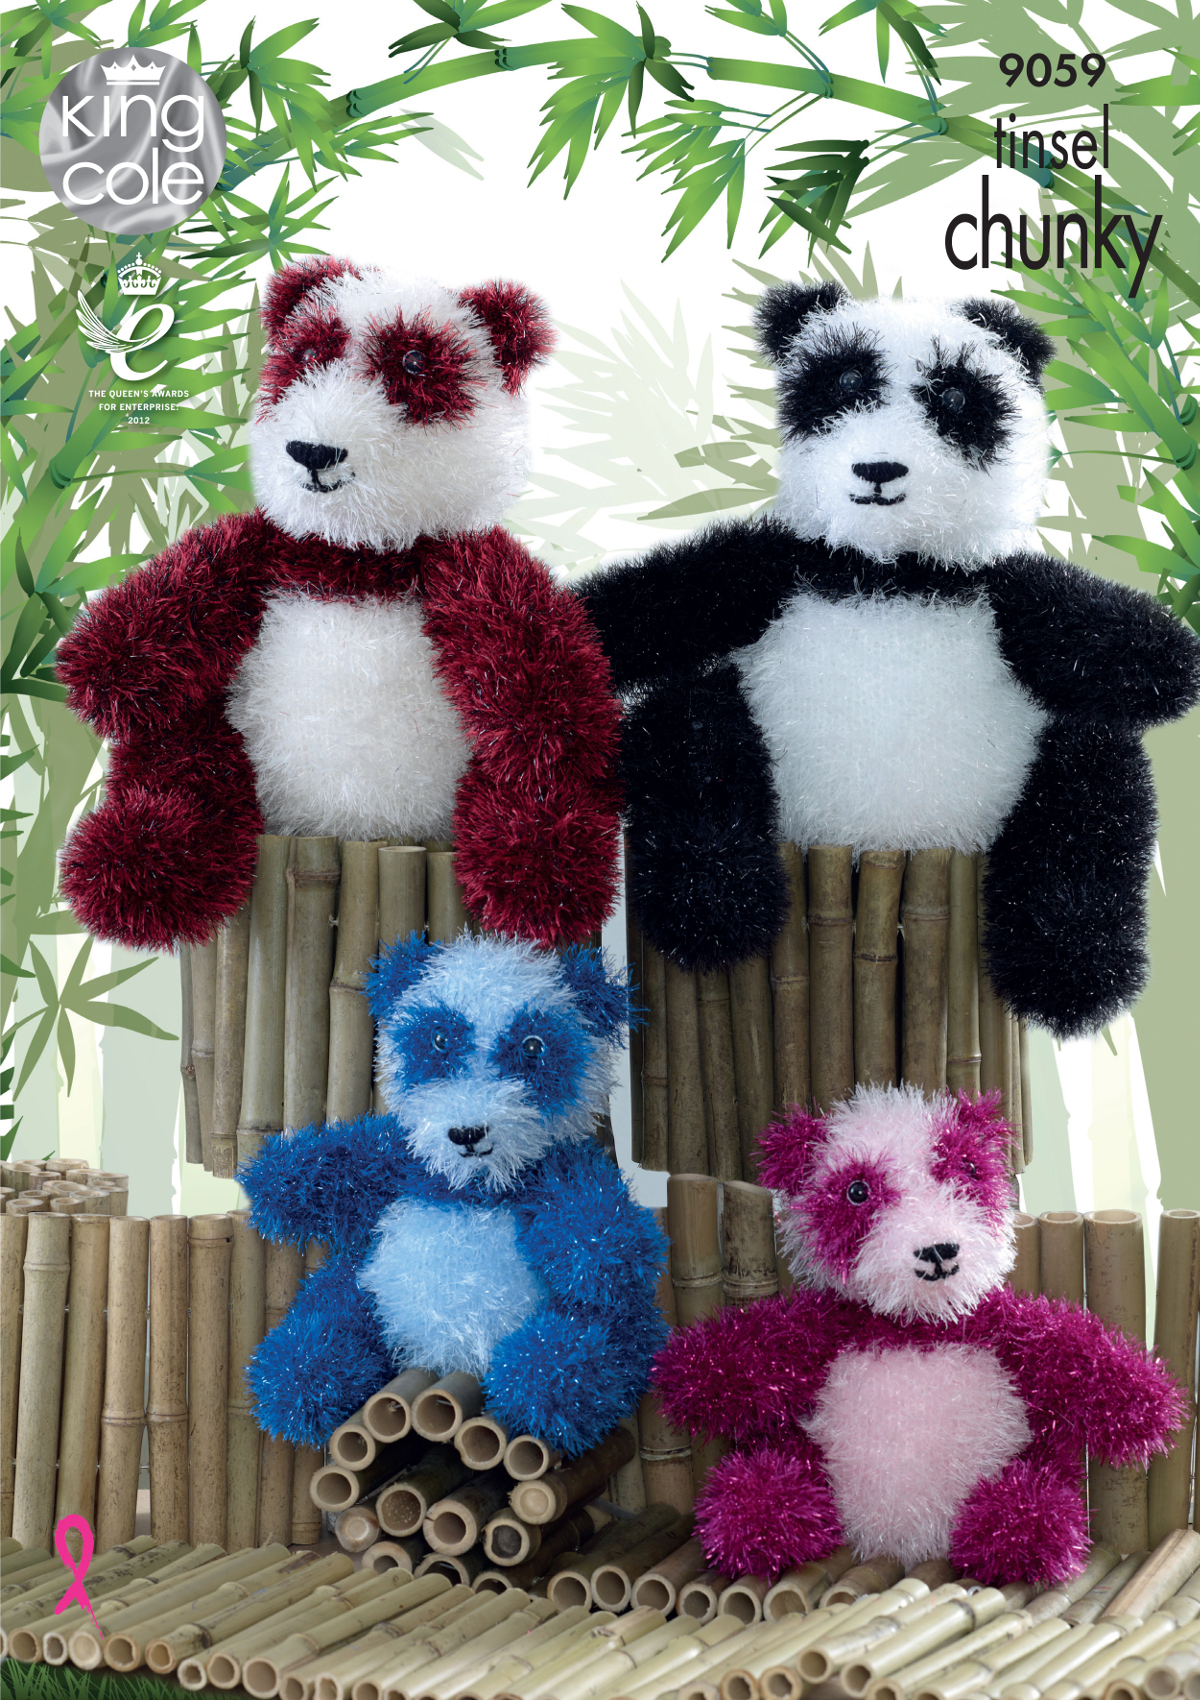 Free Knitting Patterns Panda Toy : Tinsel Chunky Knitting Pattern Adult or Baby Panda Bear Toys King Cole 9059 ...